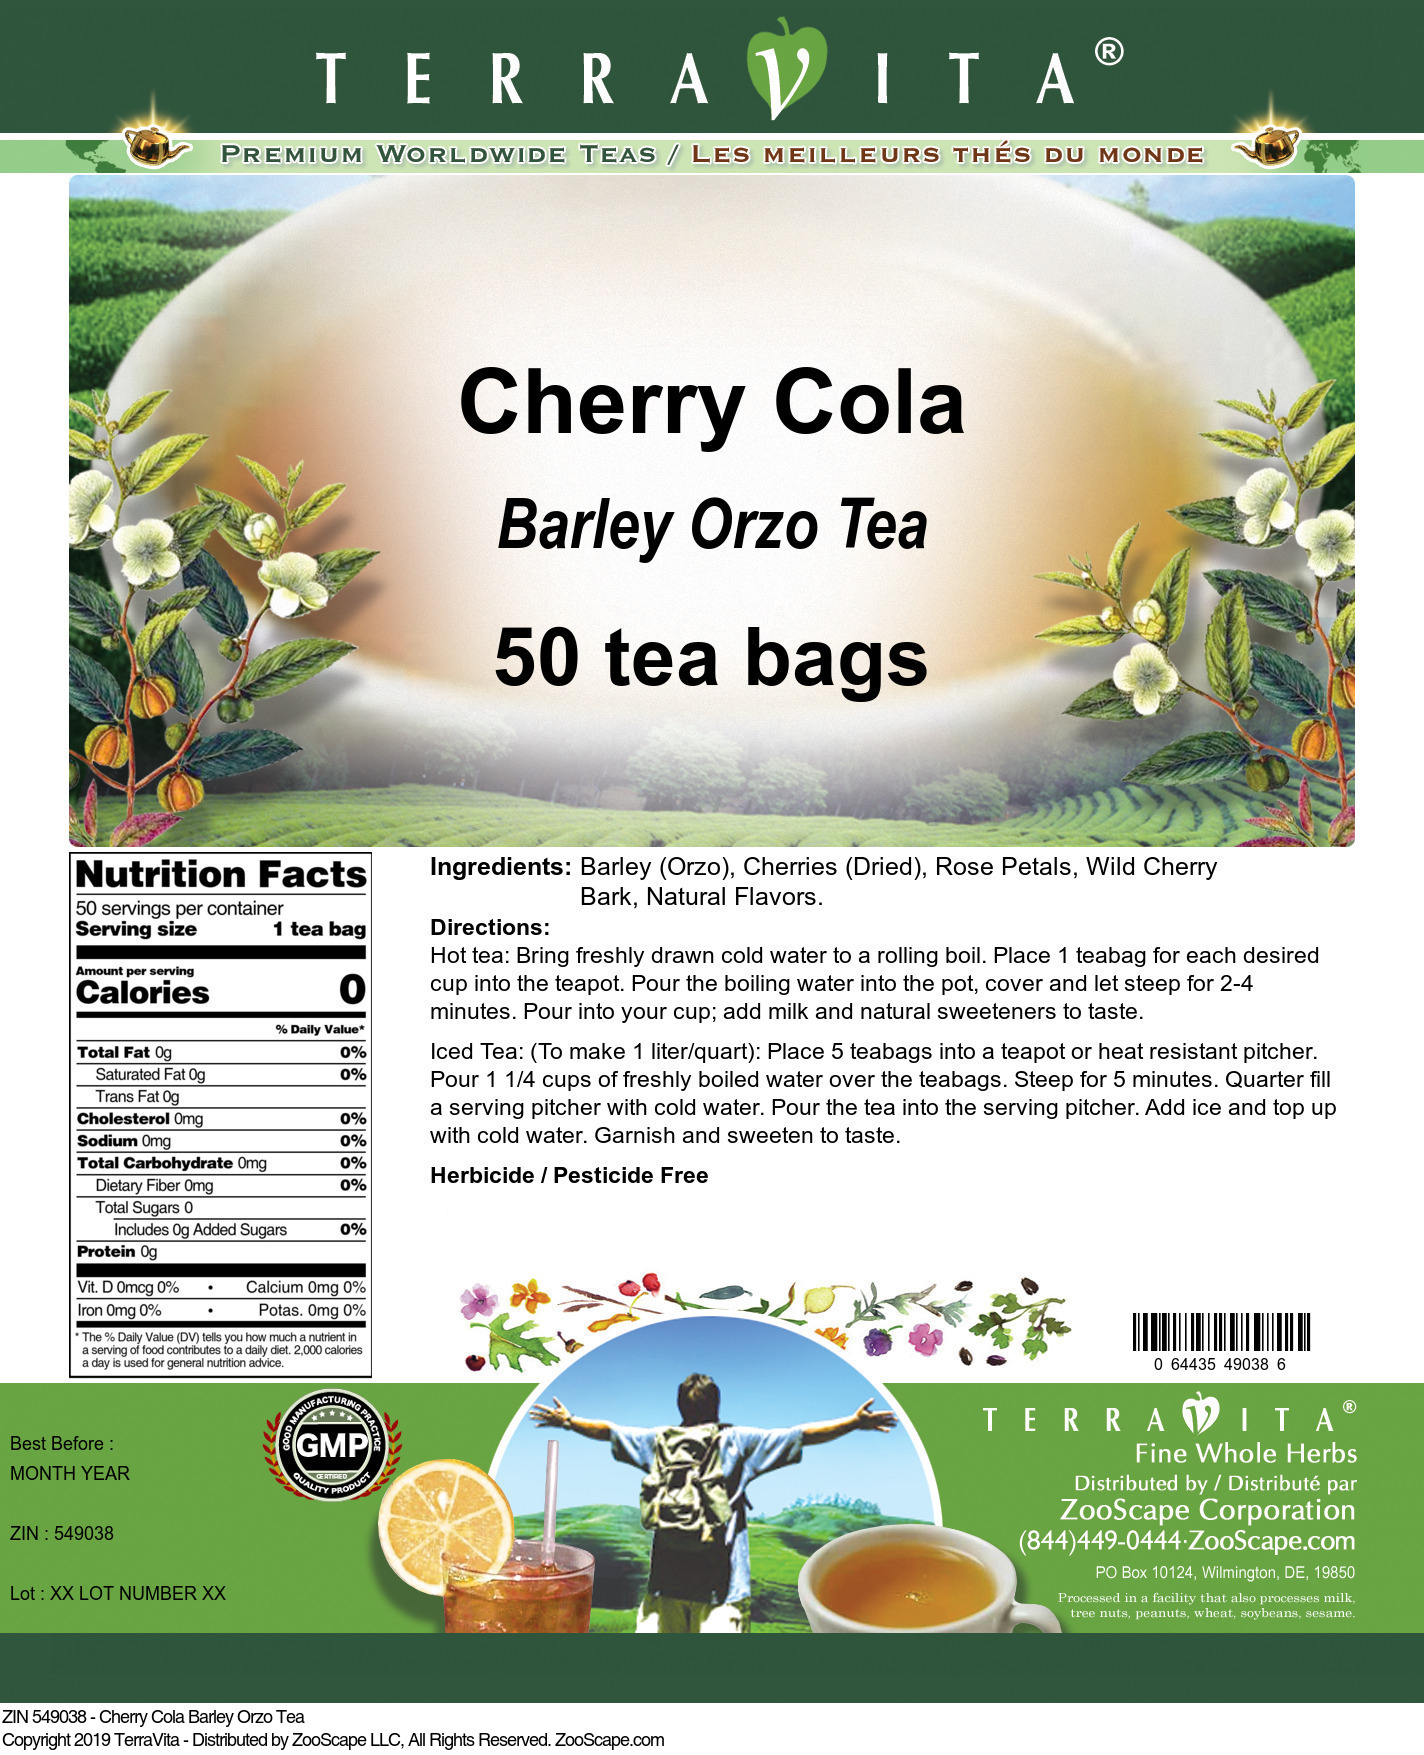 Cherry Cola Barley Orzo Tea